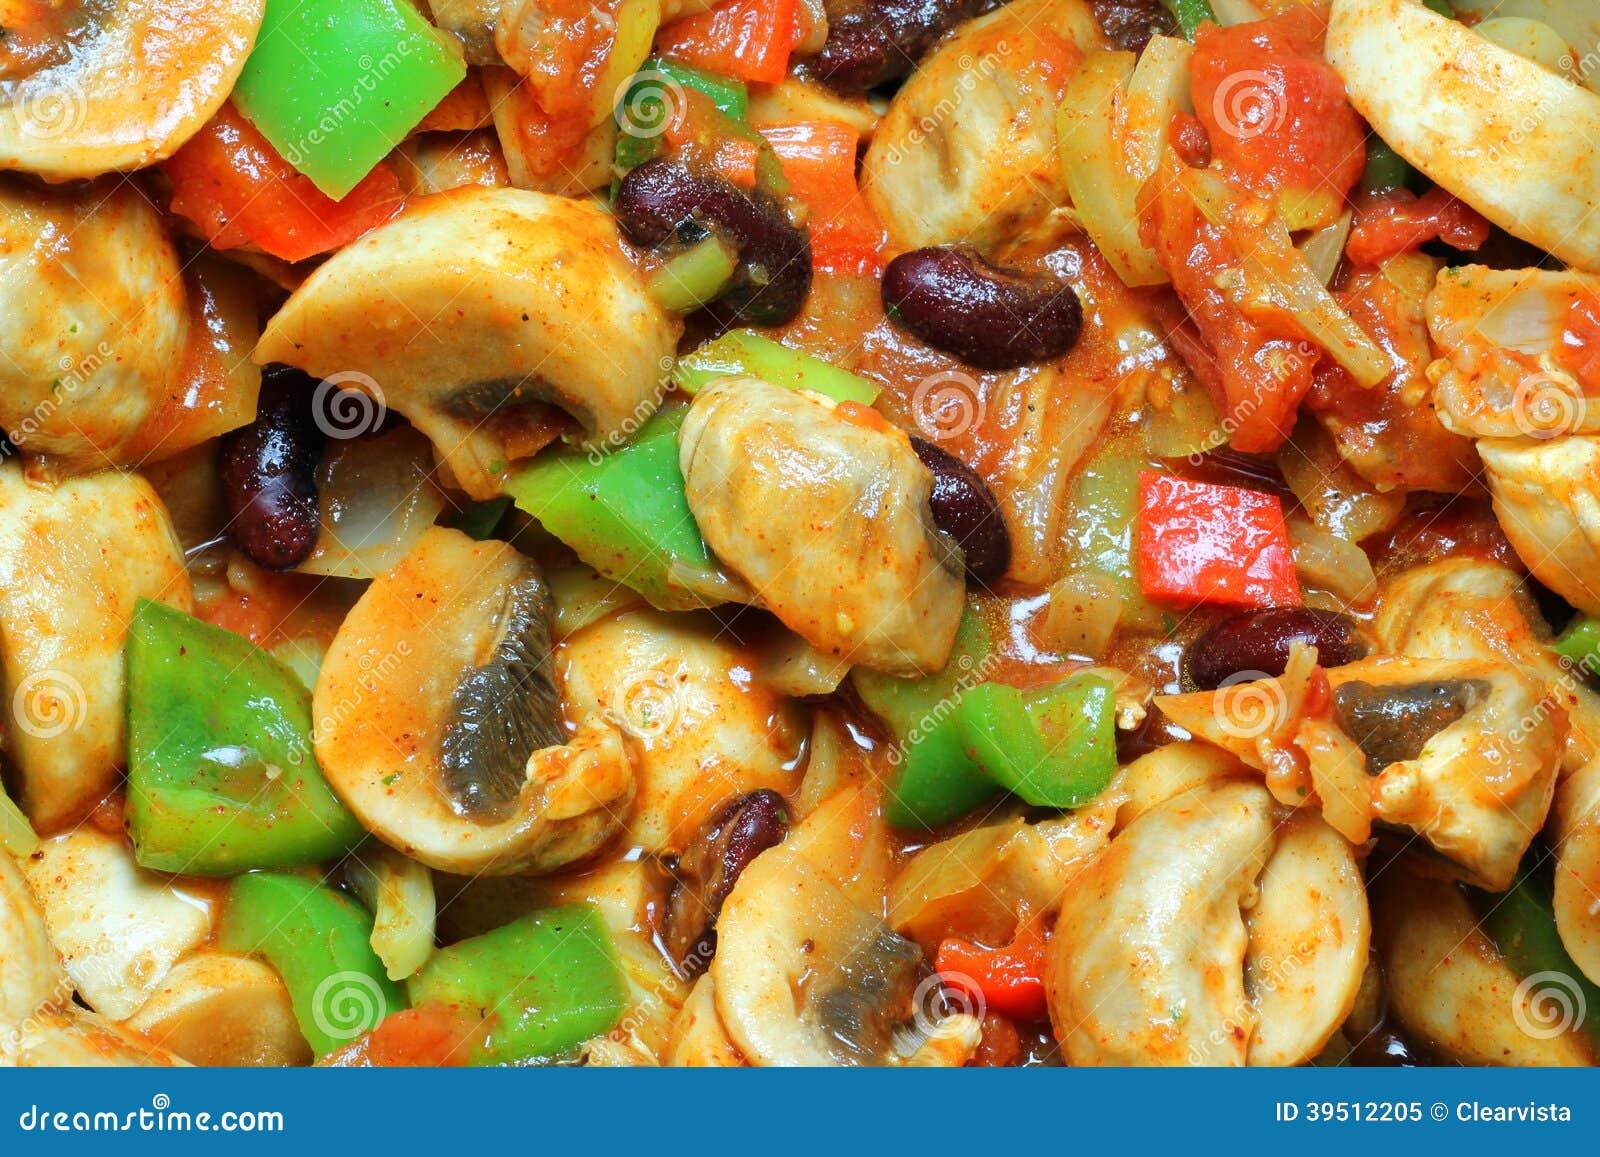 Vegetable chilli background.